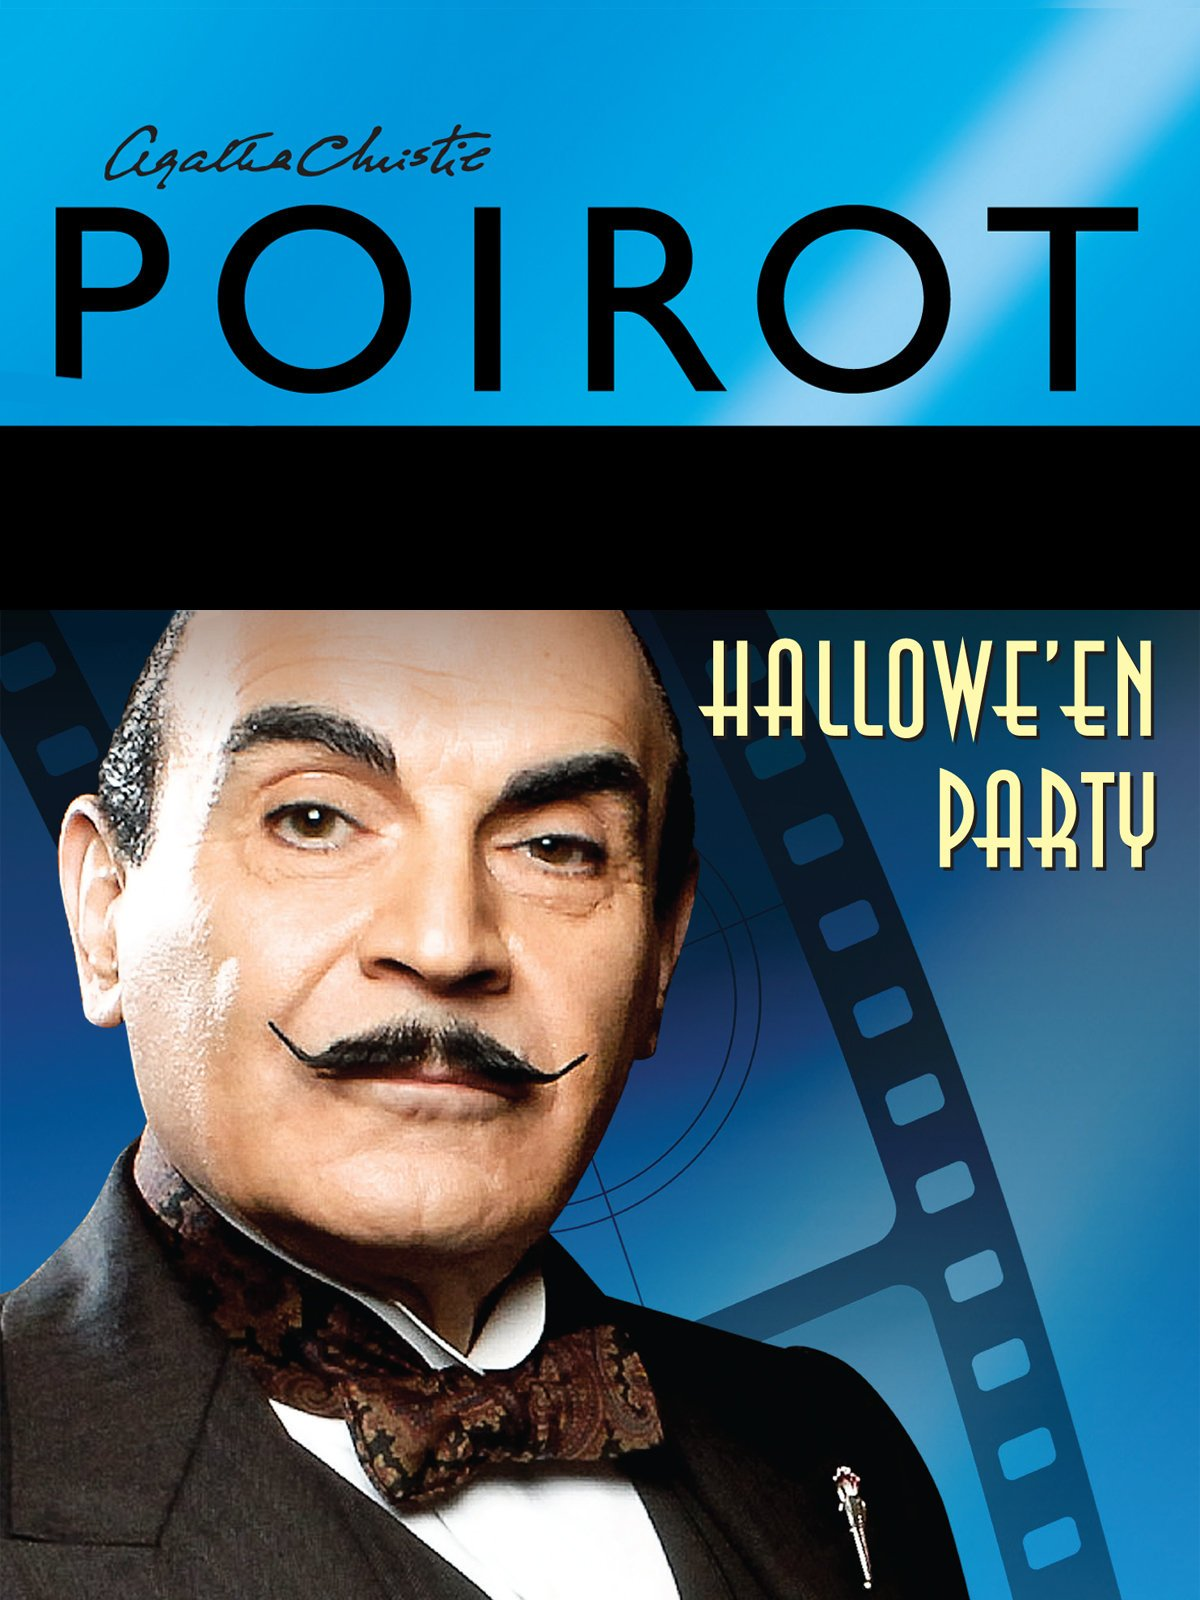 Amazon.com: Agatha Christie's Poirot: Hallowe'en Party: David ...